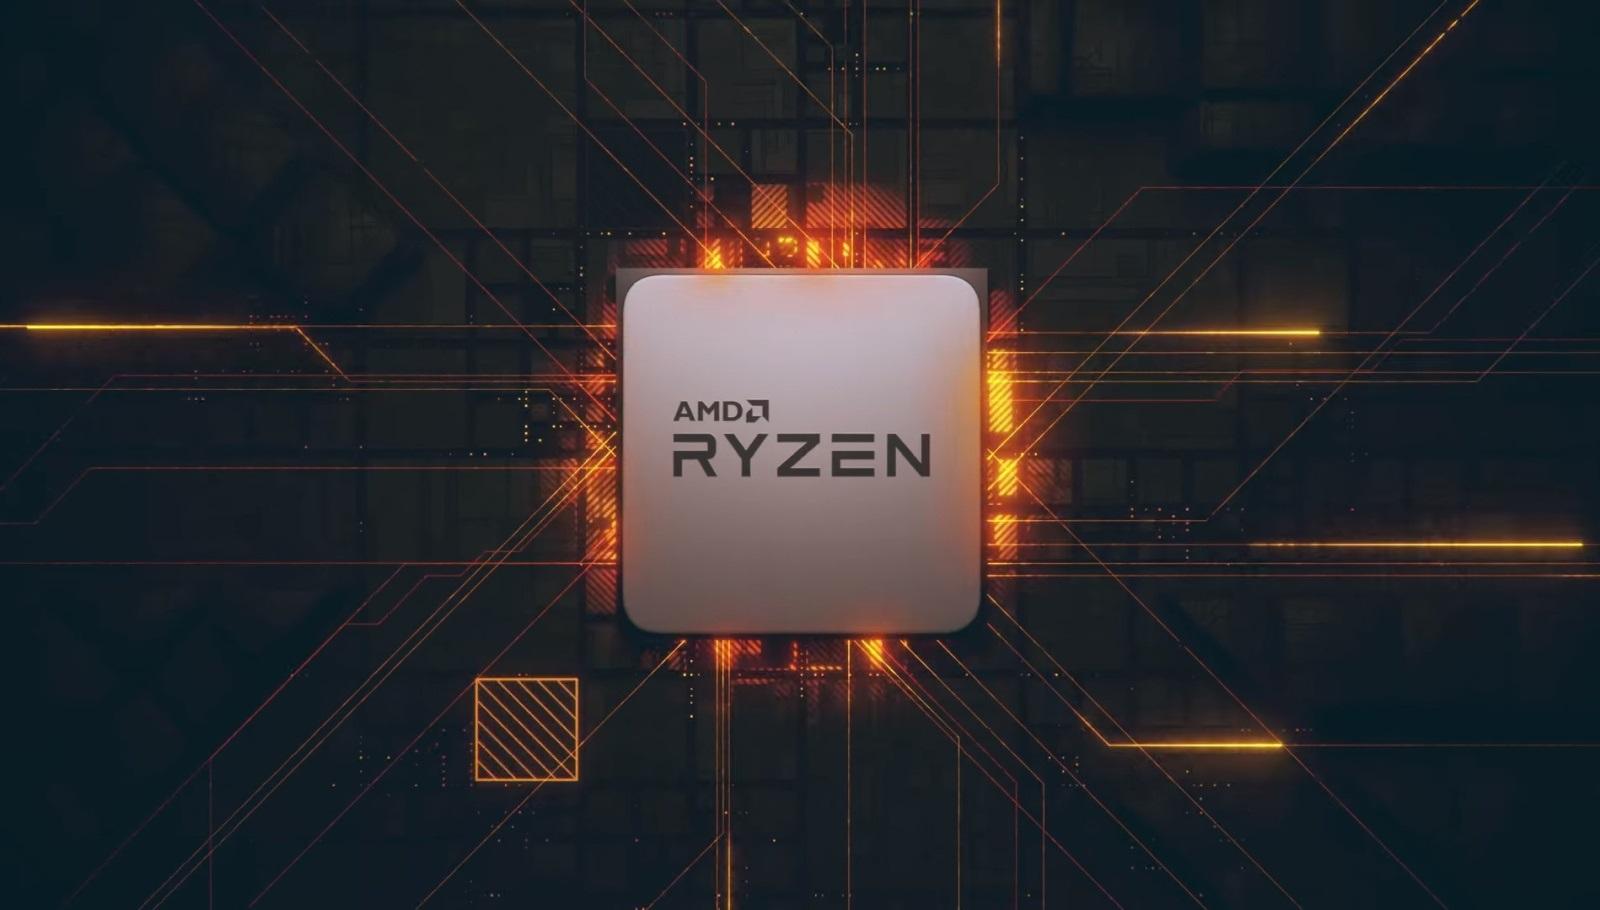 PlayStation 5; screenshot: AMD ryzen